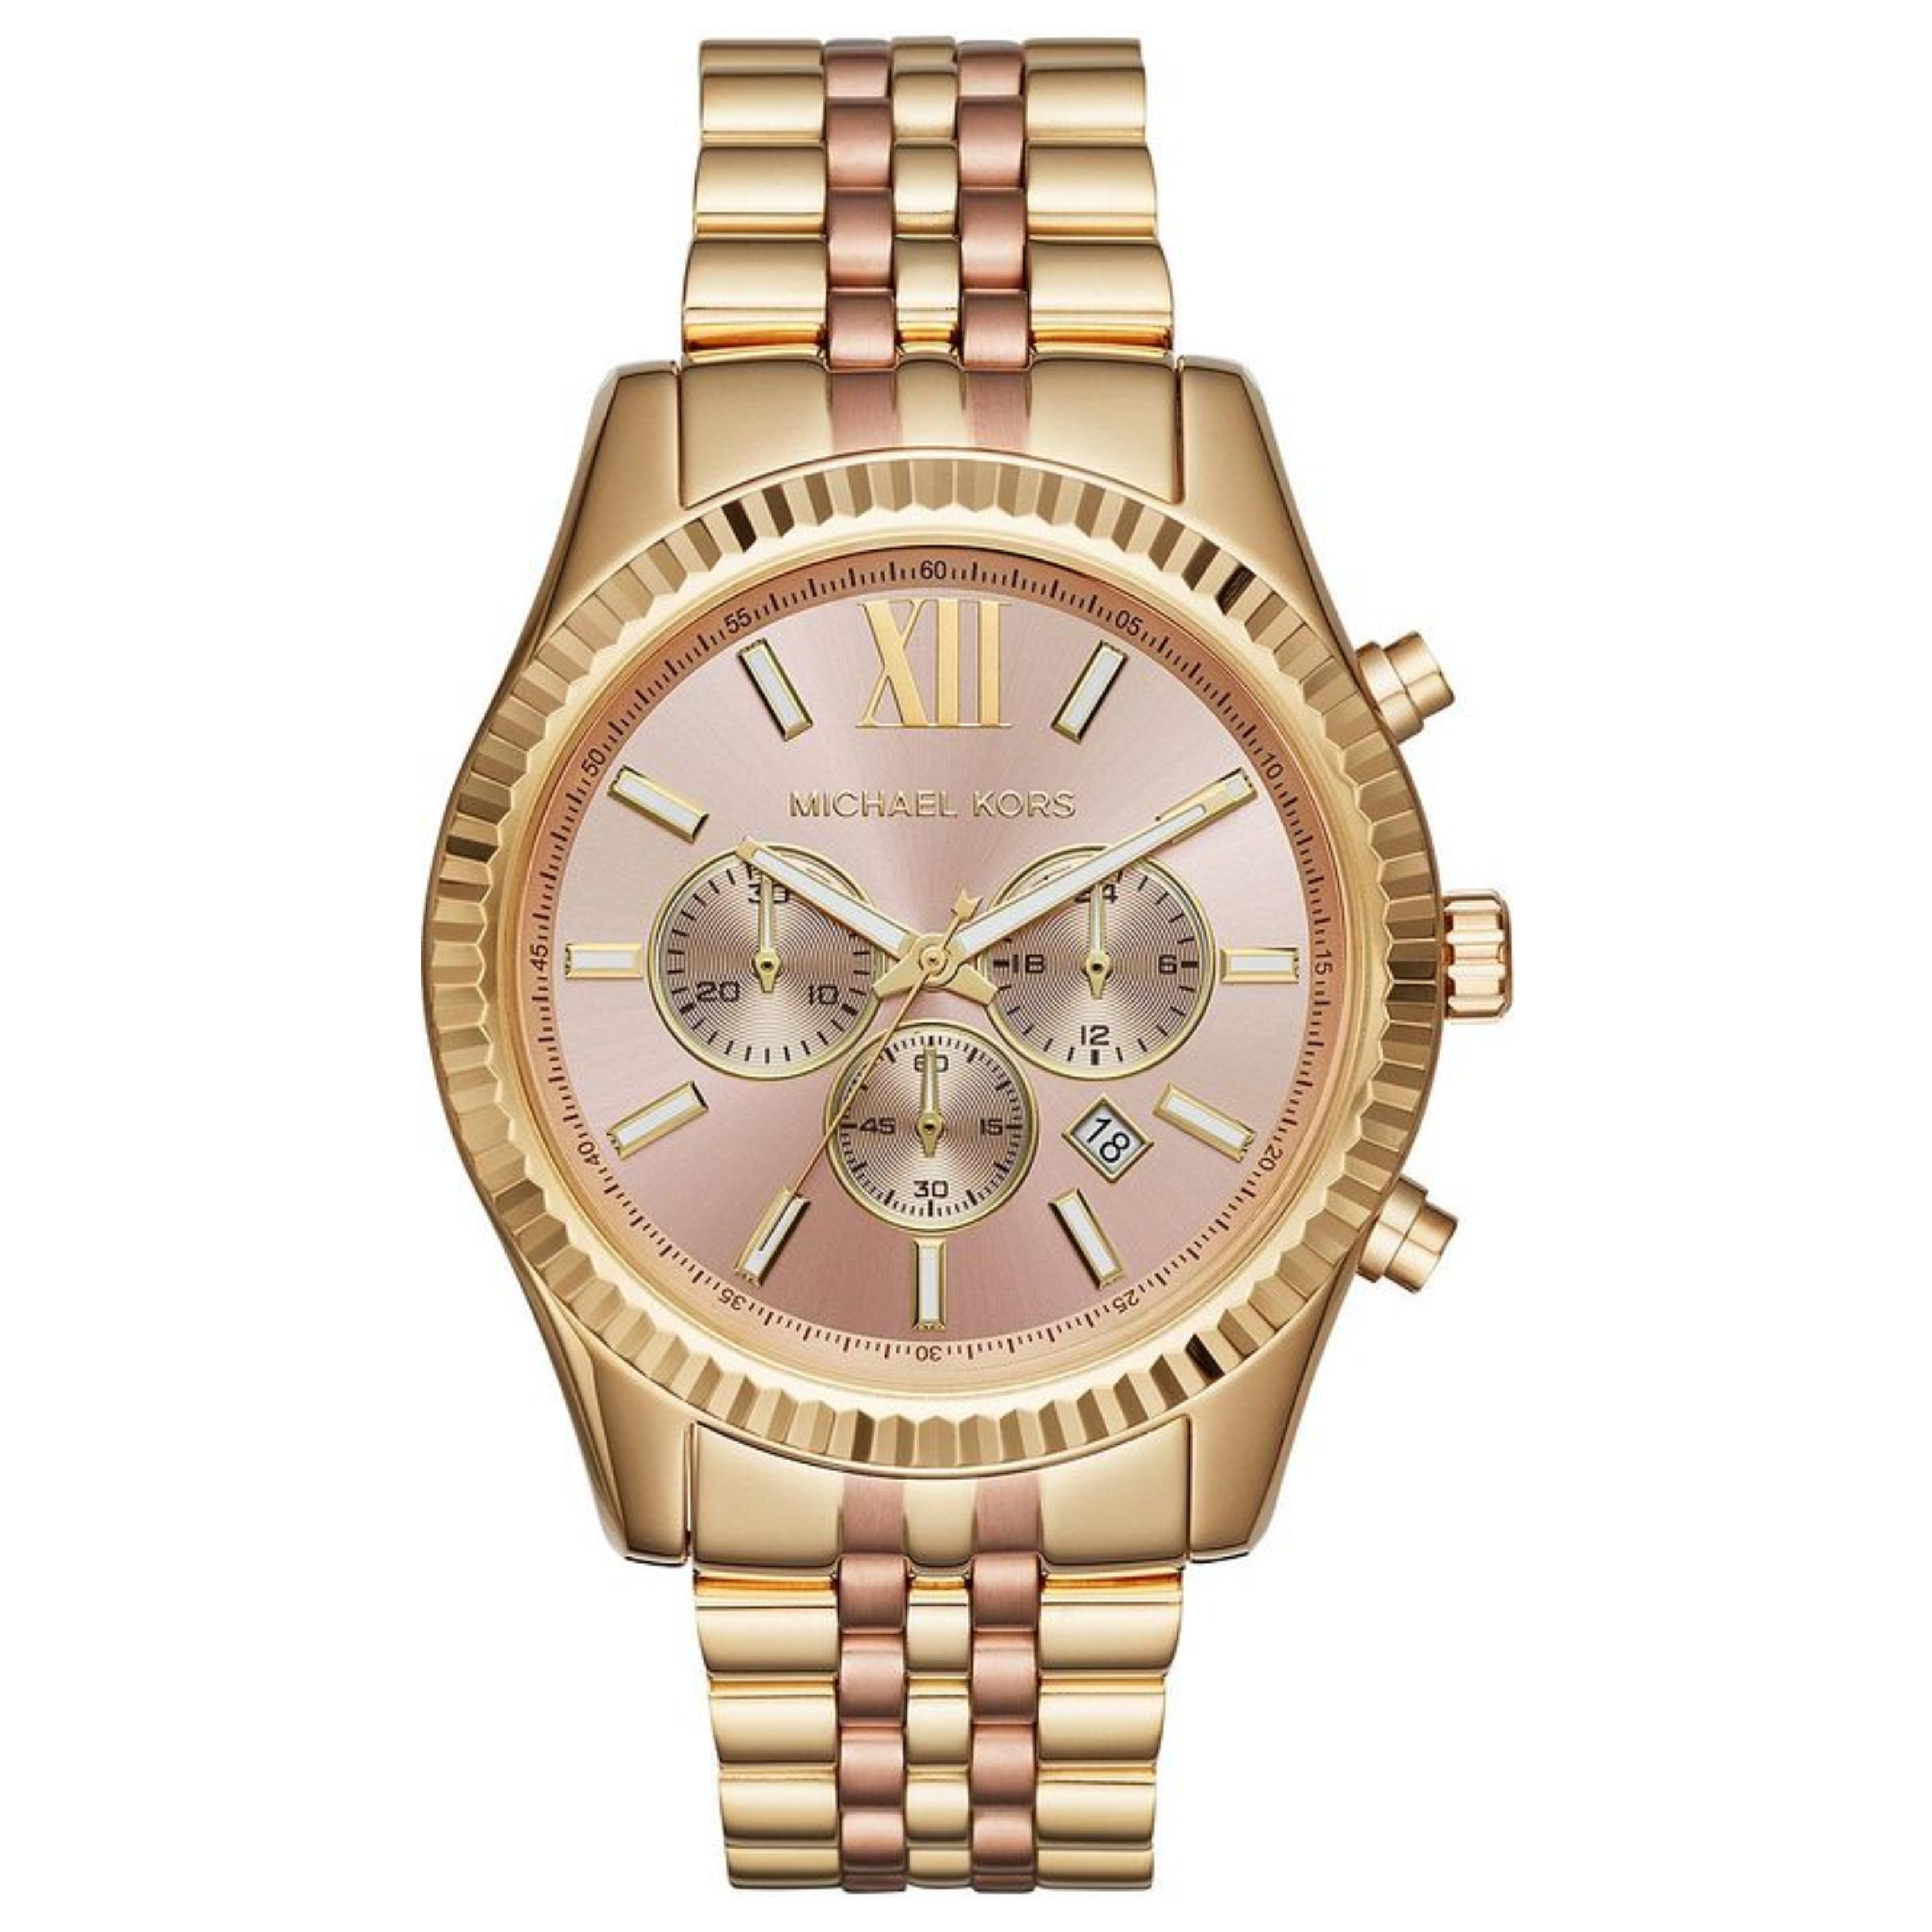 d00812f822057 Sentinel Michael Kors Lexington Rose Gold Dial Ladies Watch│Chronograph│Gold  Strap│MK6473